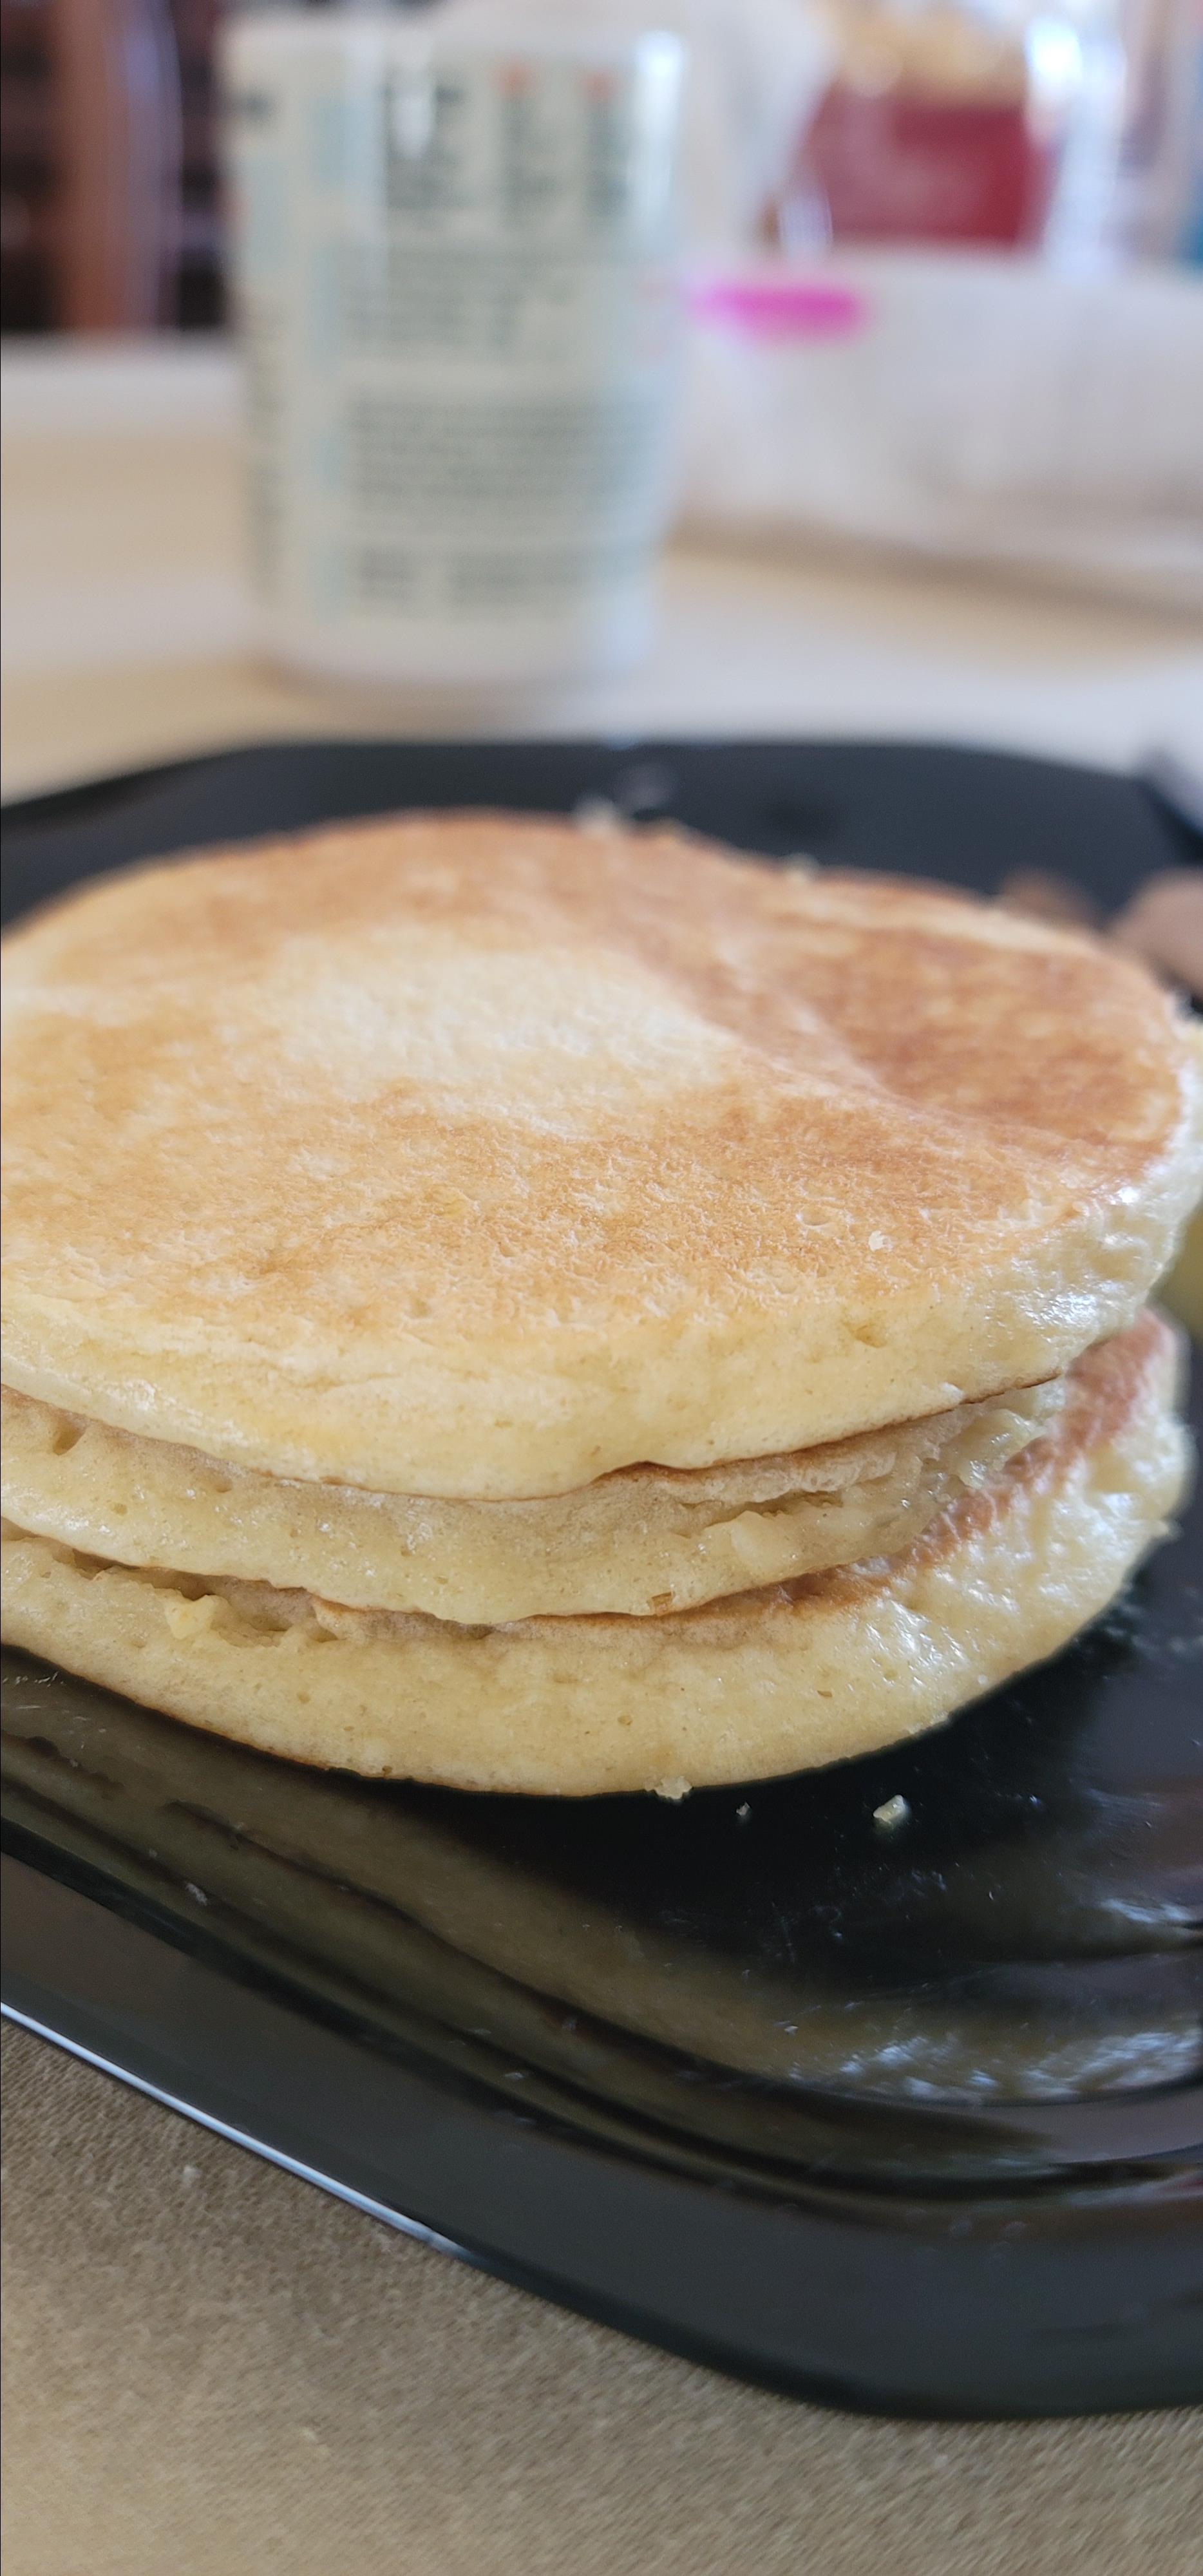 Fluffy Maple Buttermilk Pancakes Annette R